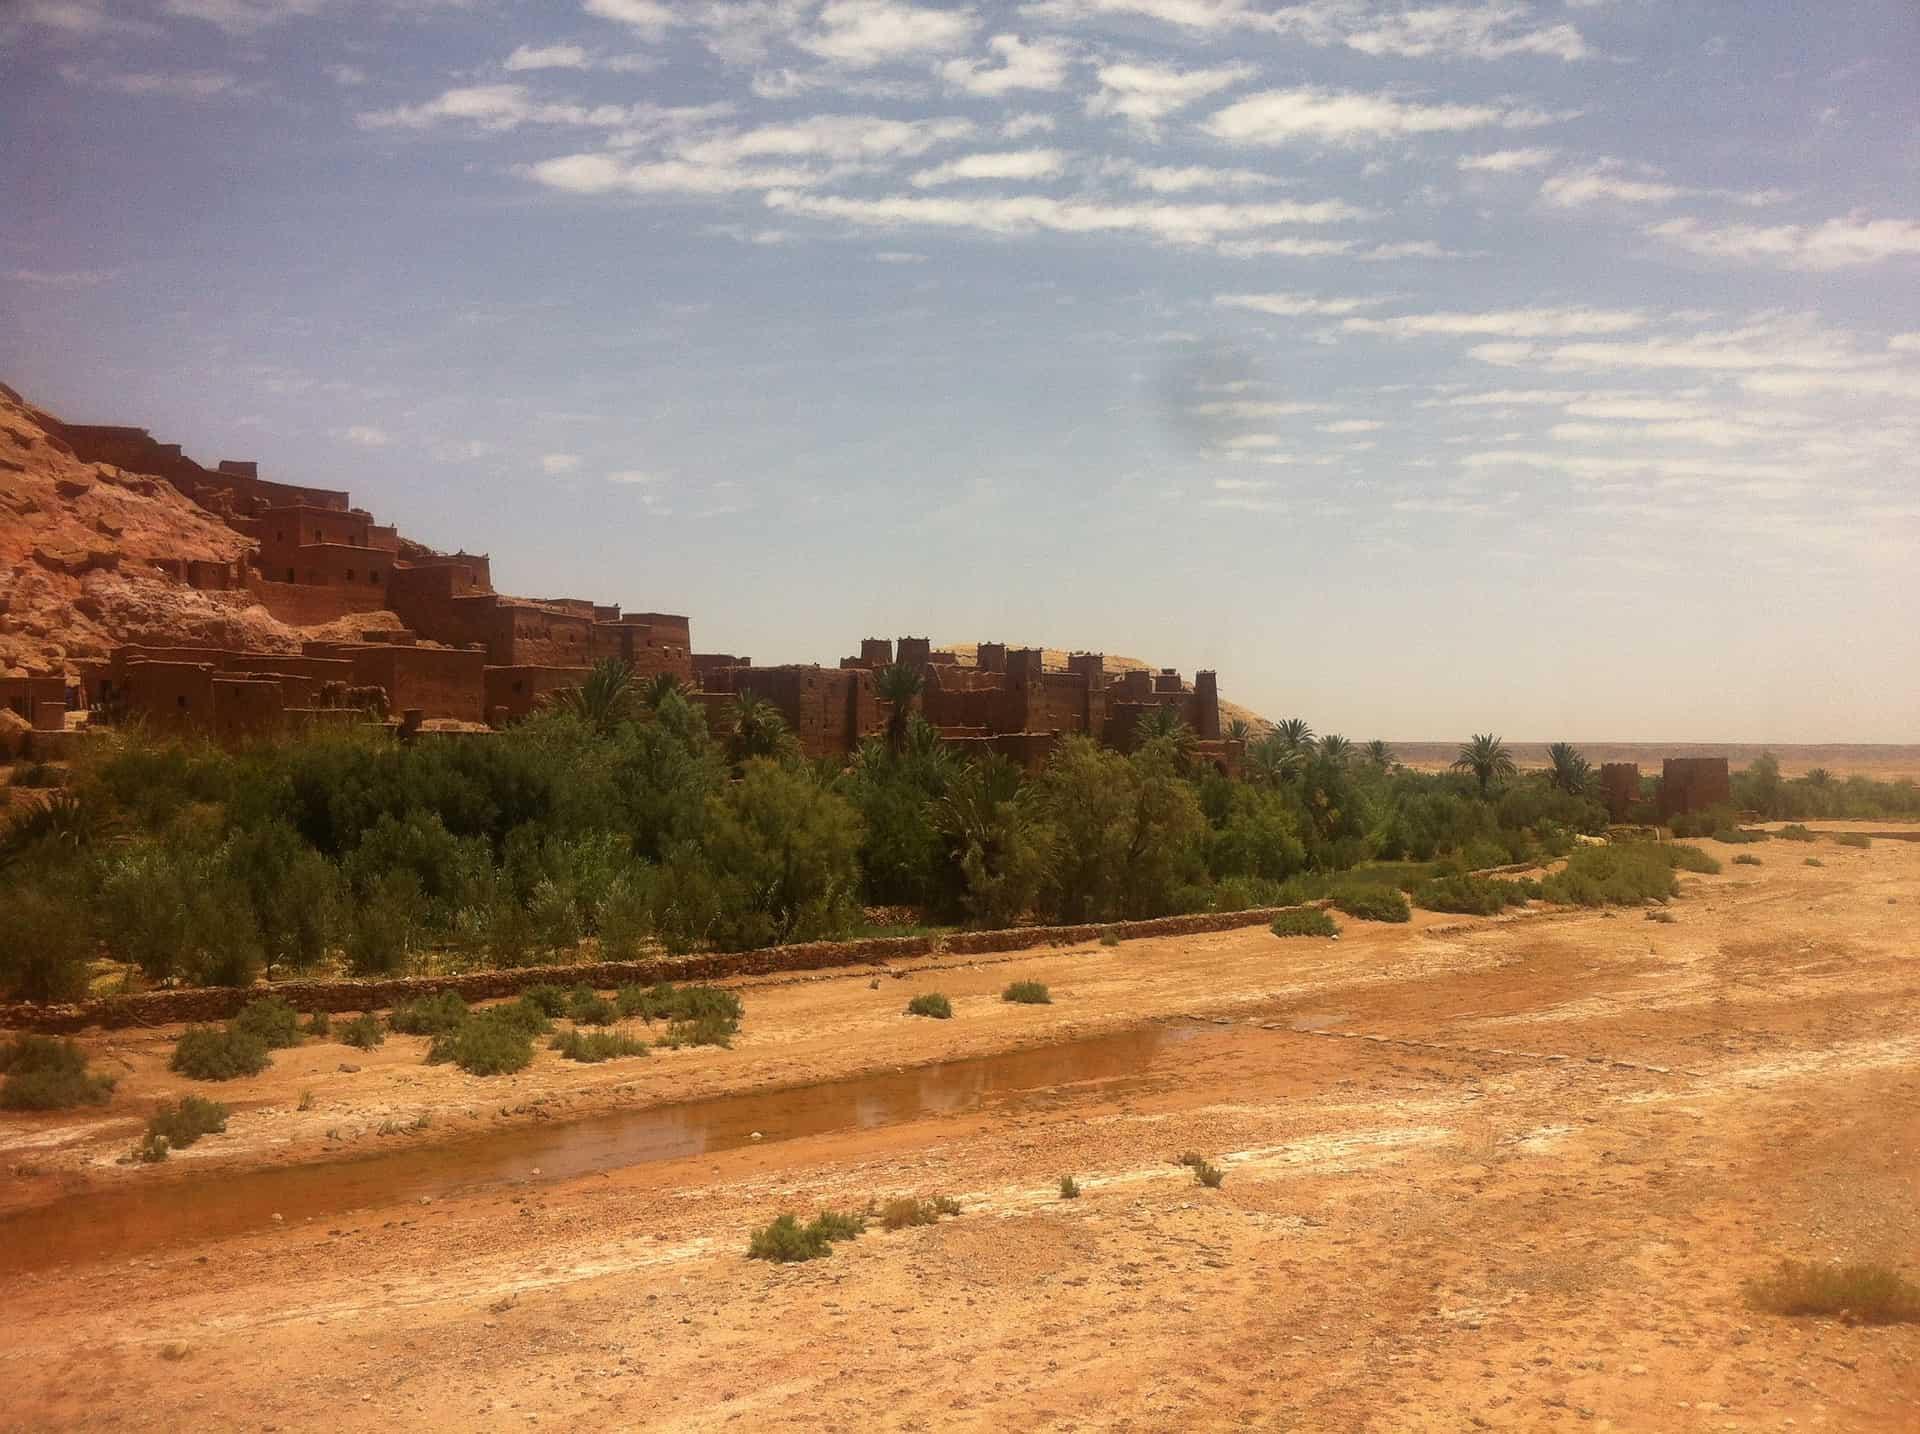 Marokko Kurztrip ab 24,48€ günstig buchen Kurzreisen